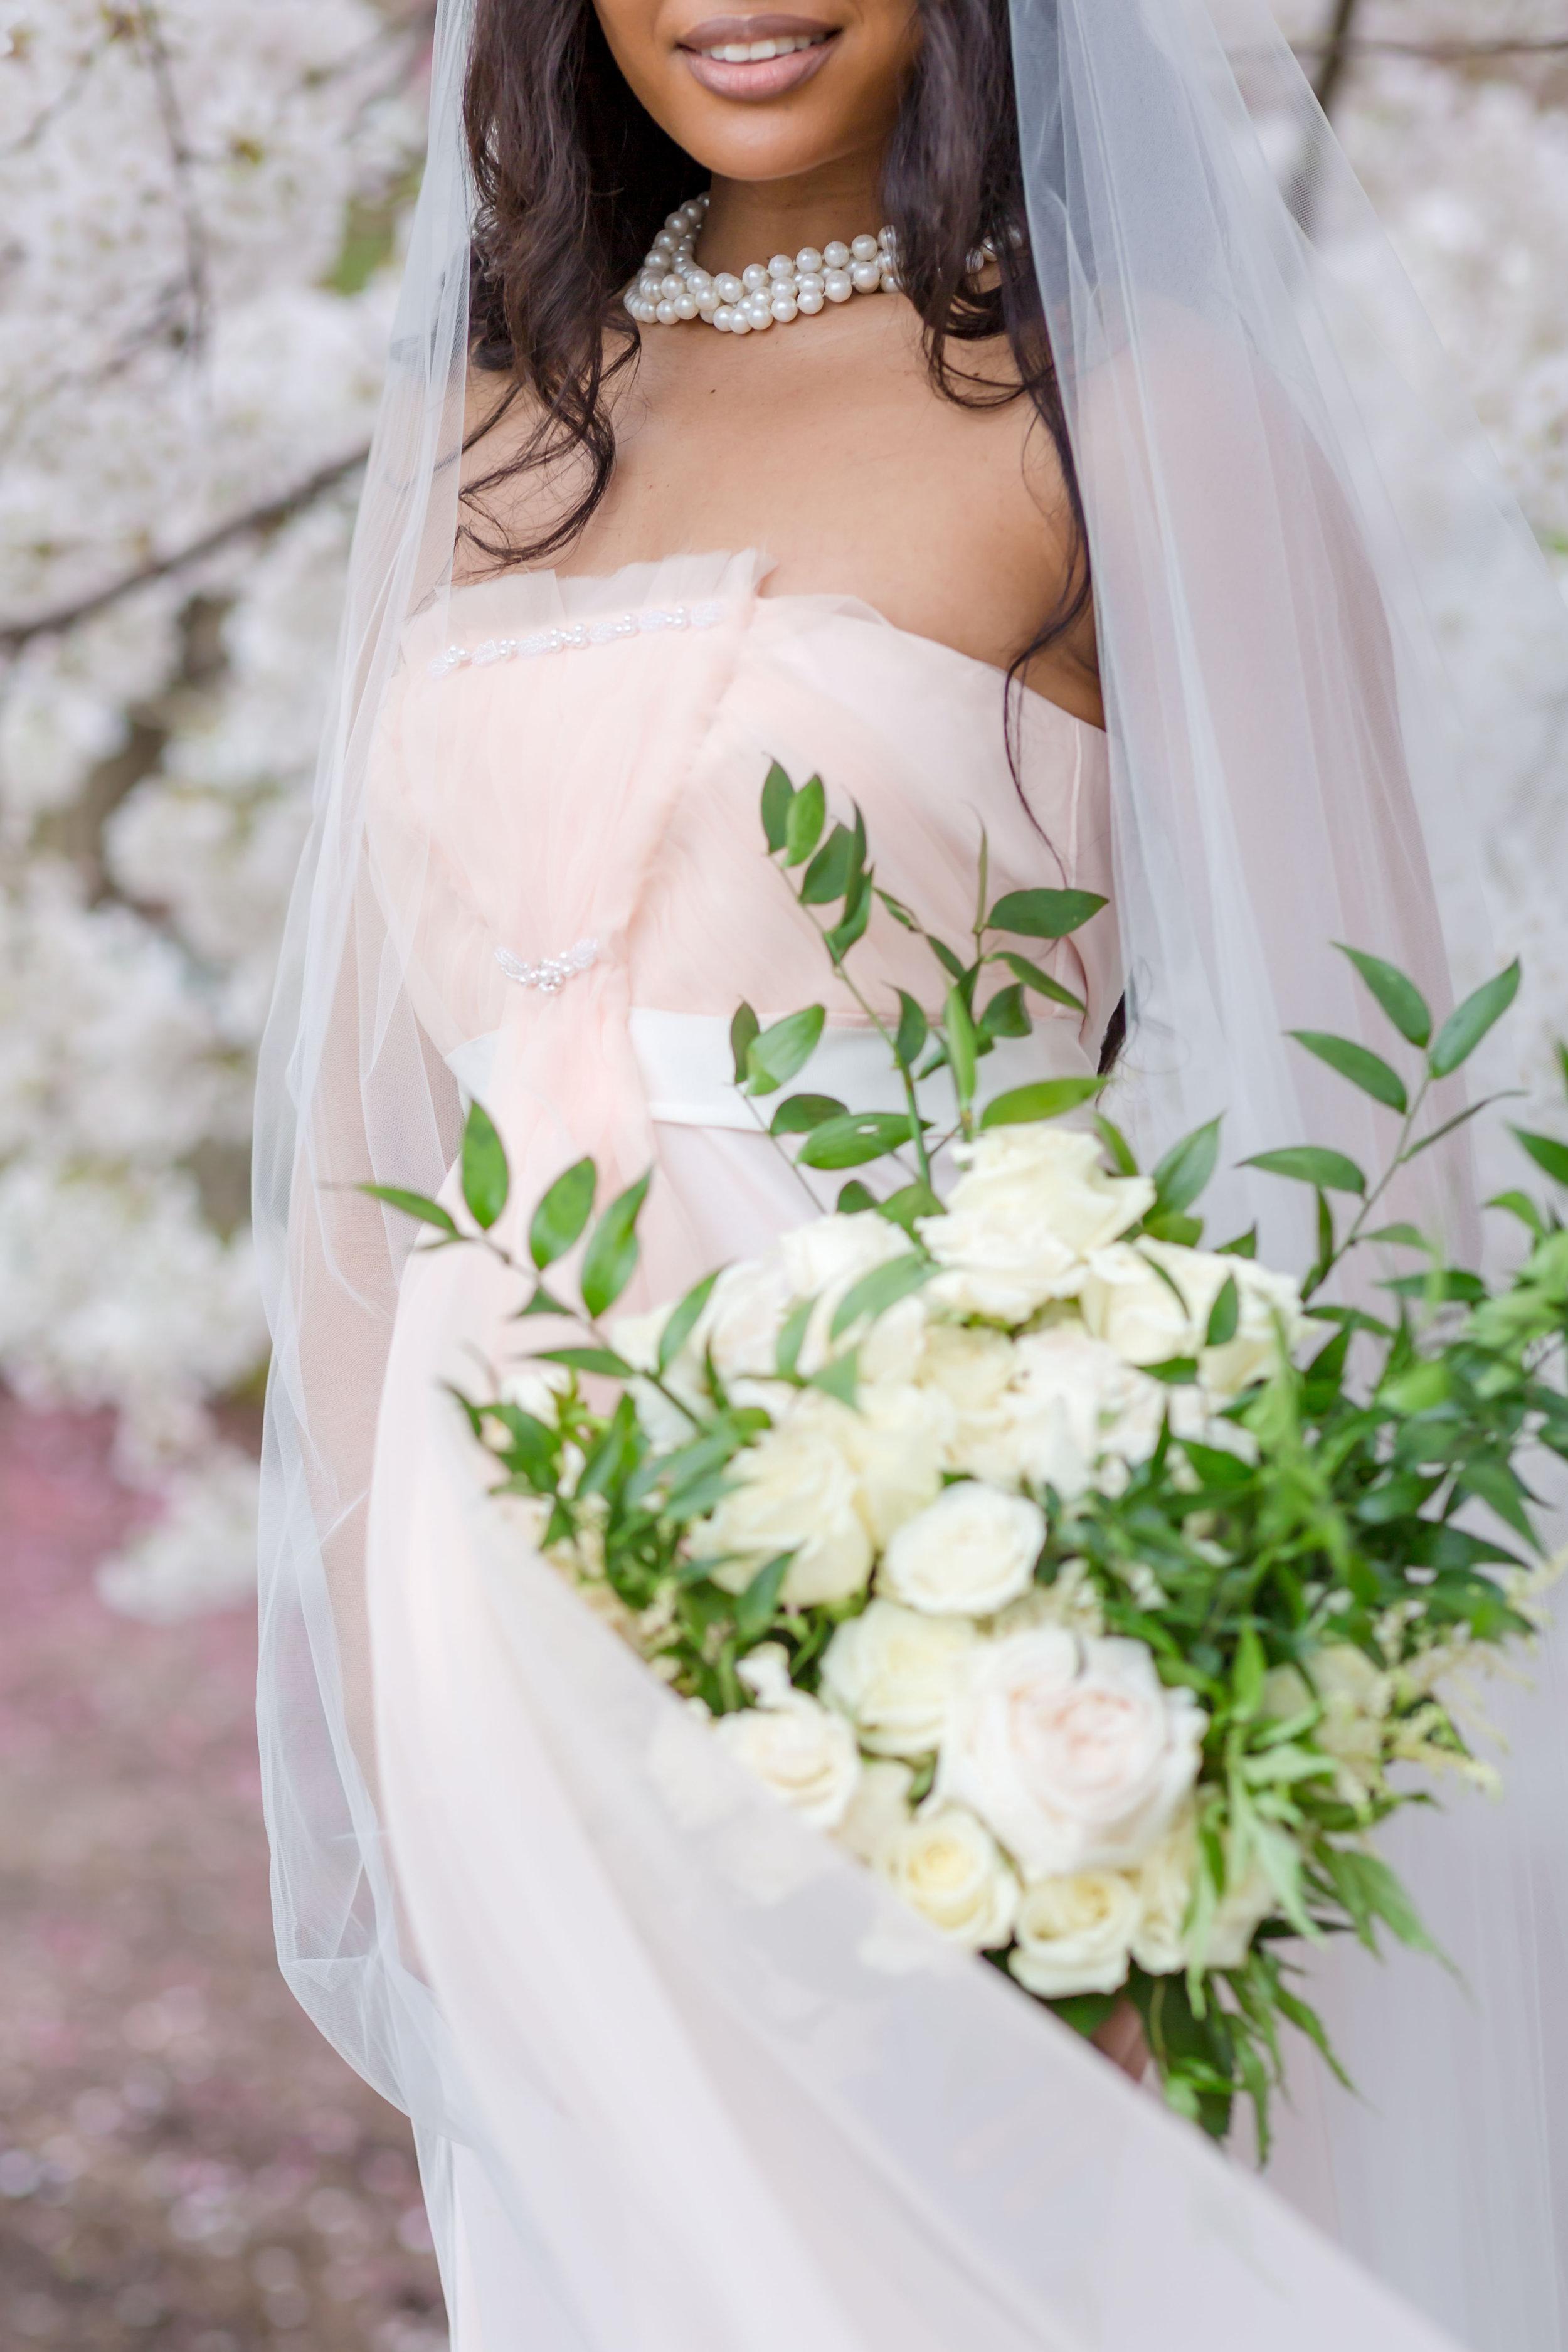 ScarlettExpressions-StyledShoot-Bridal-66.jpg